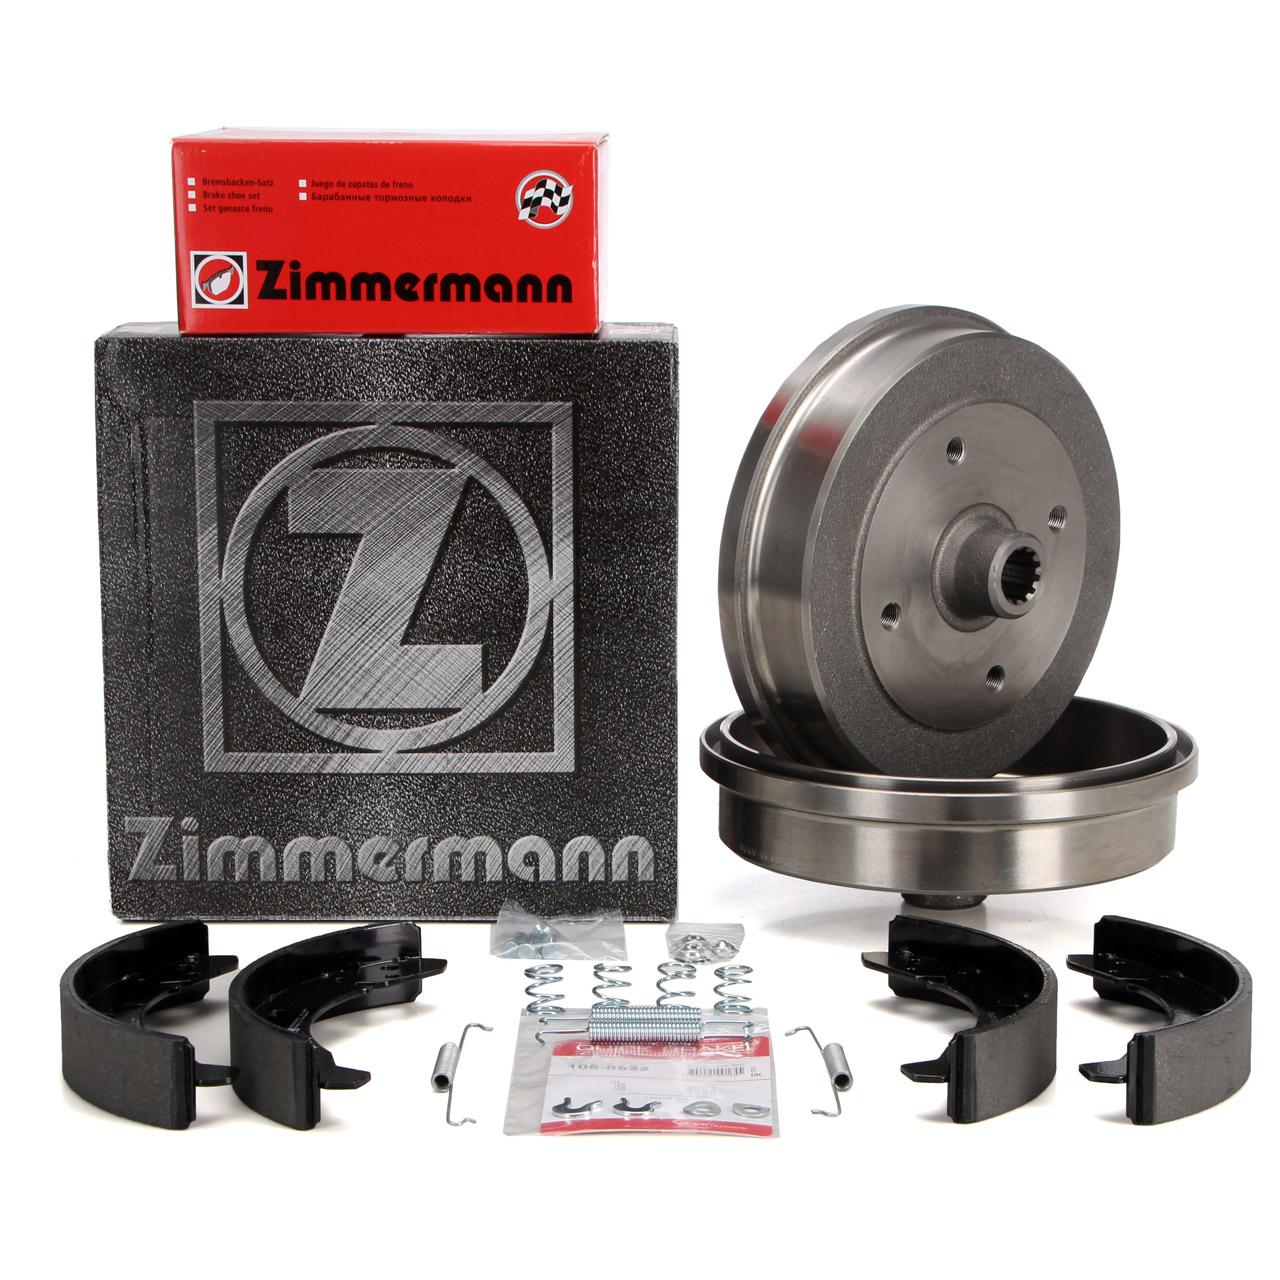 ZIMMERMANN Bremstrommeln + Backen VW Käfer 1200 1300 1302 1303 1500 hinten